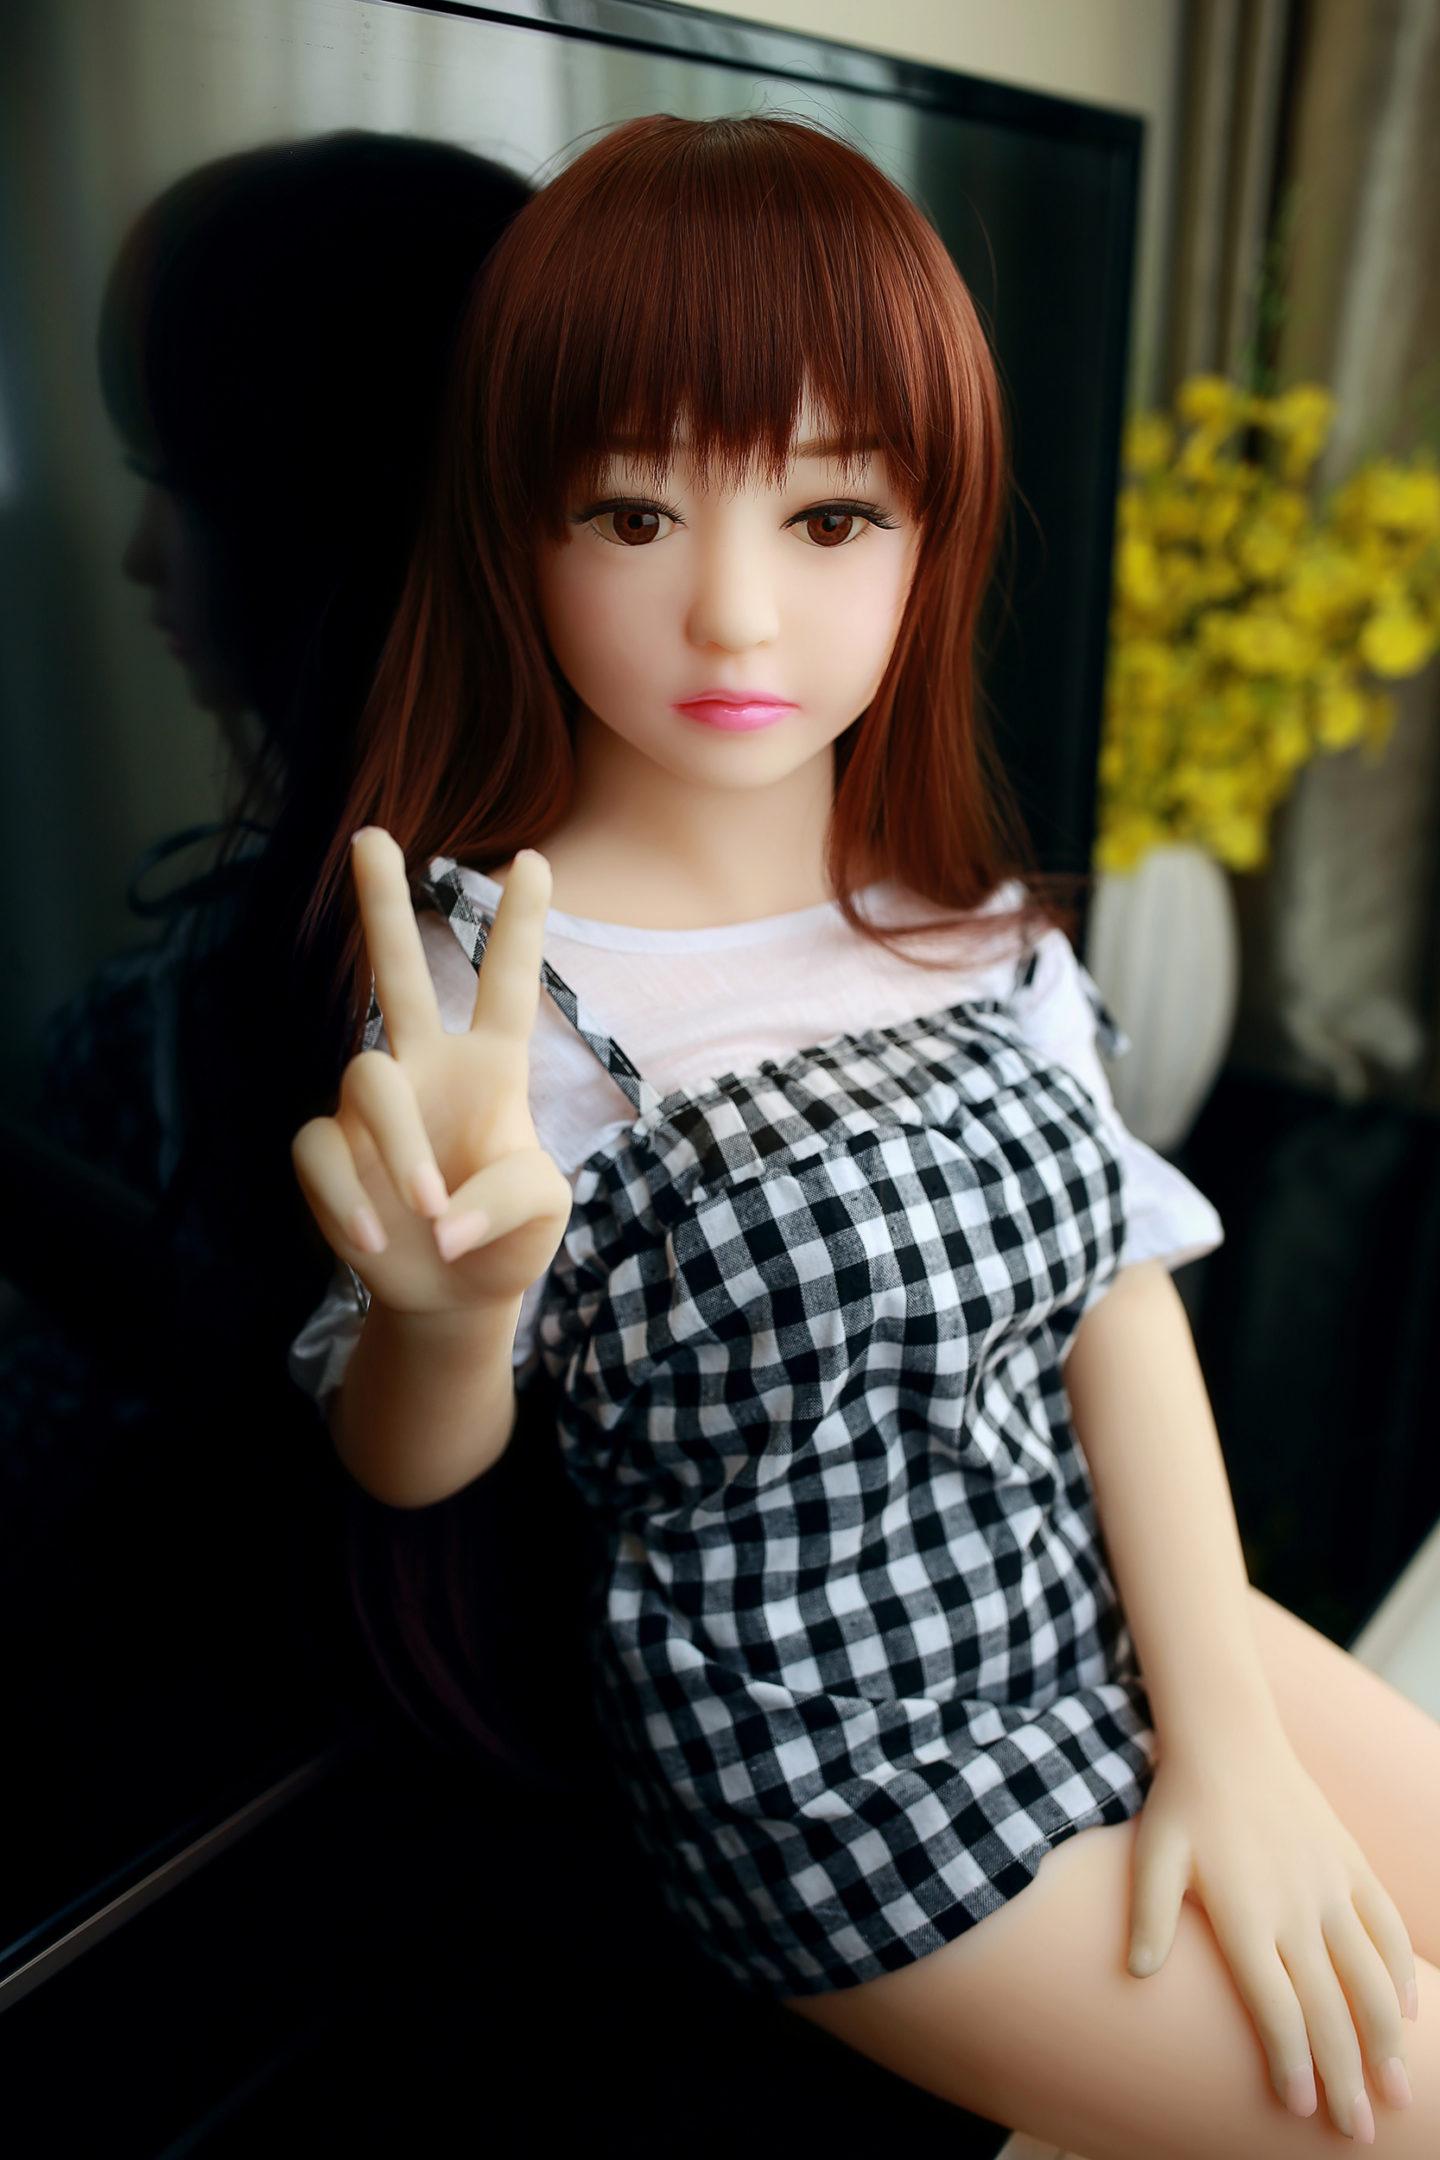 Renee - Cutie Doll 3' 11 (120cm) Cup B